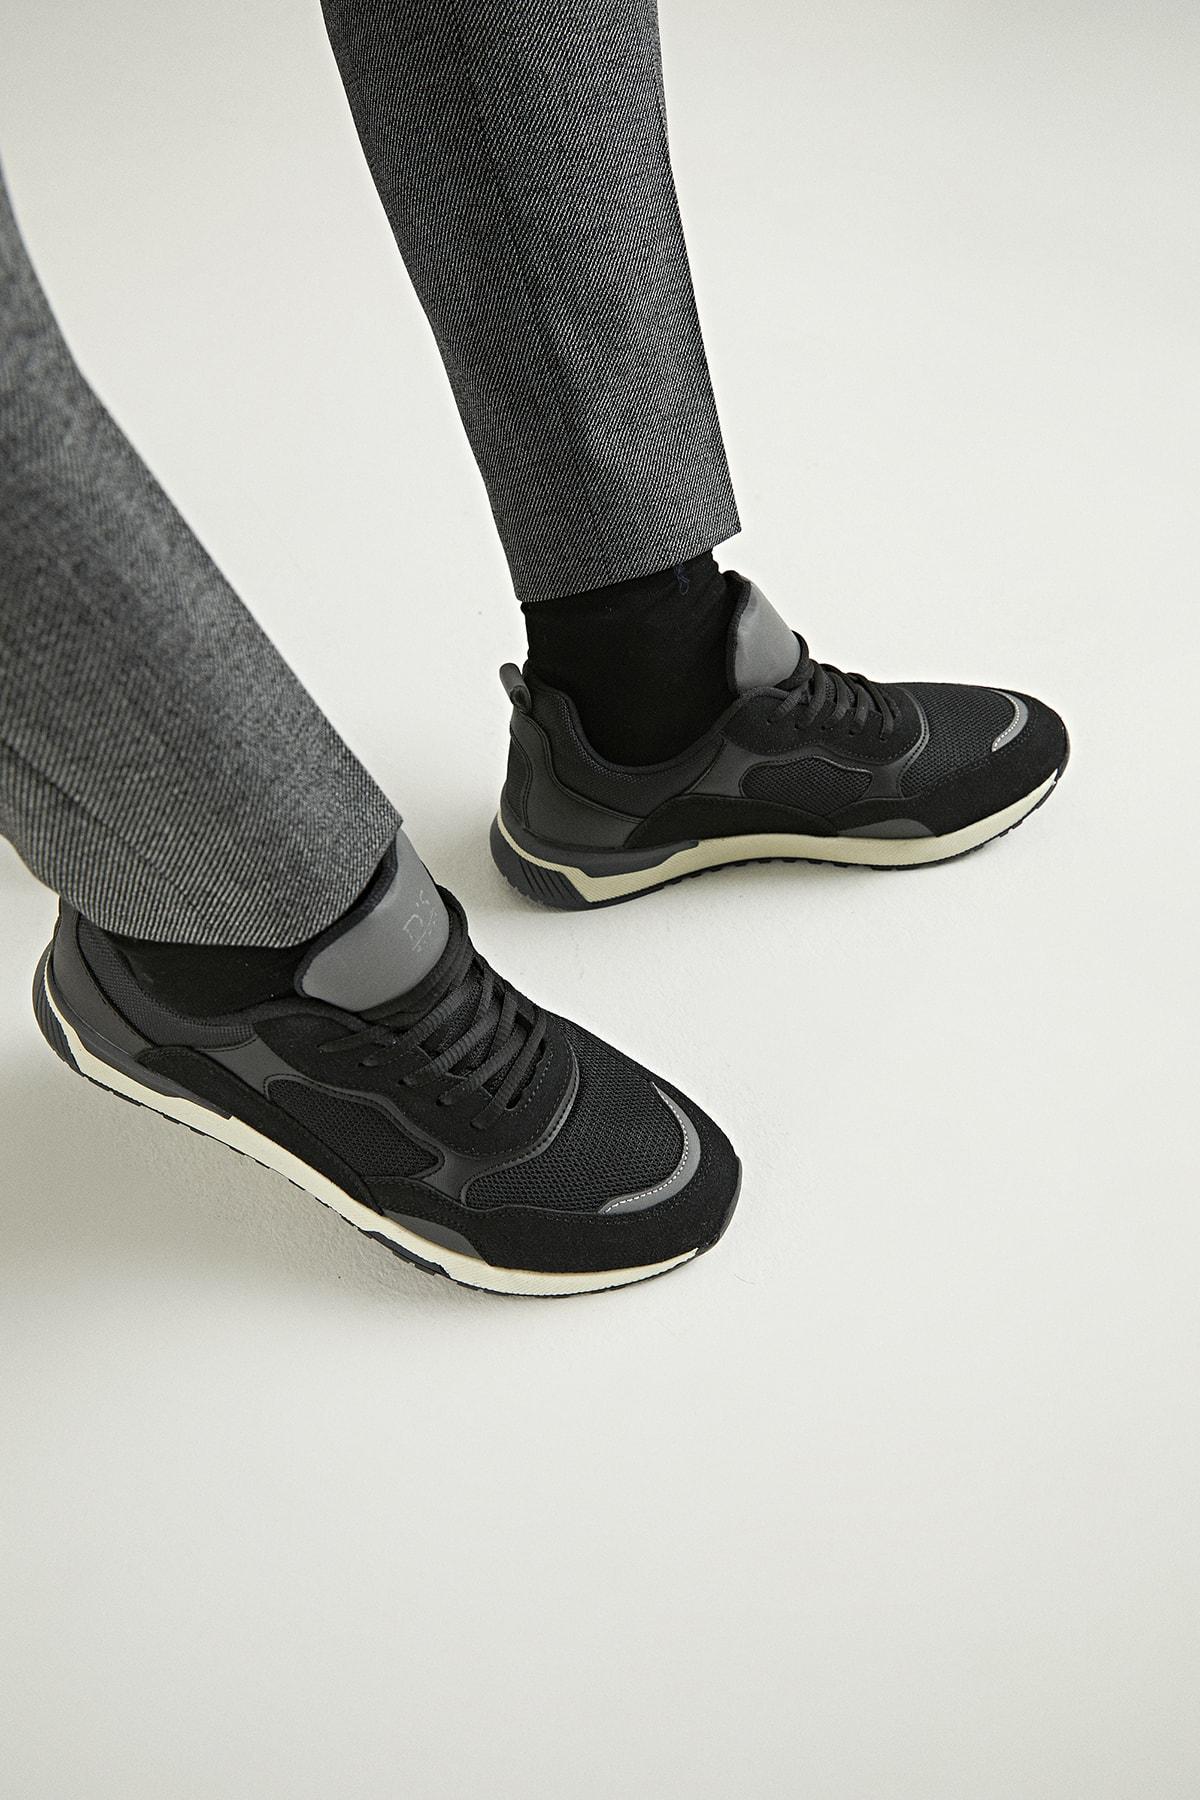 Twn Erkek Ayakkabı Siyah Renk 1